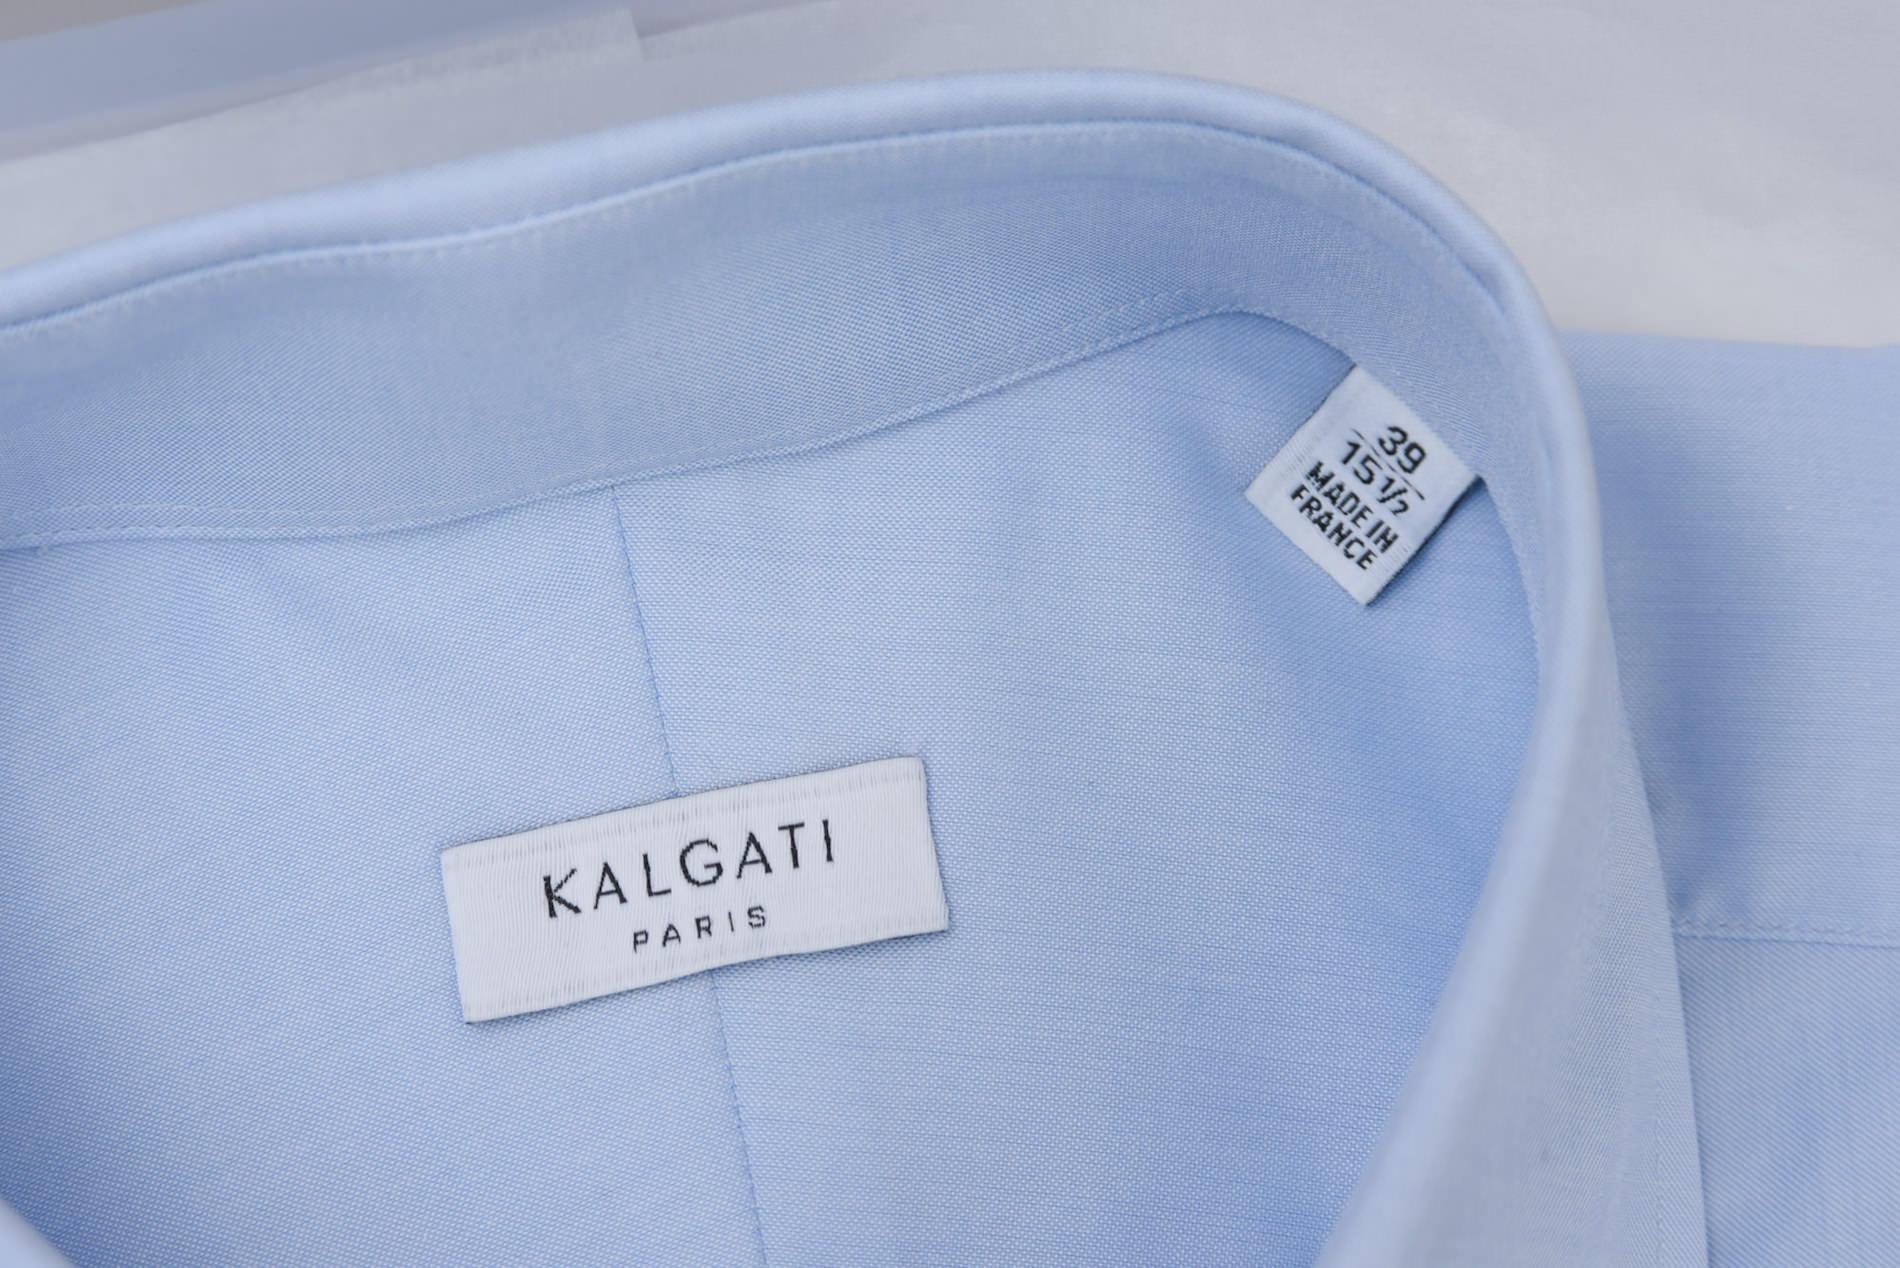 kalgati-x-verygoodlord-3-sur-27